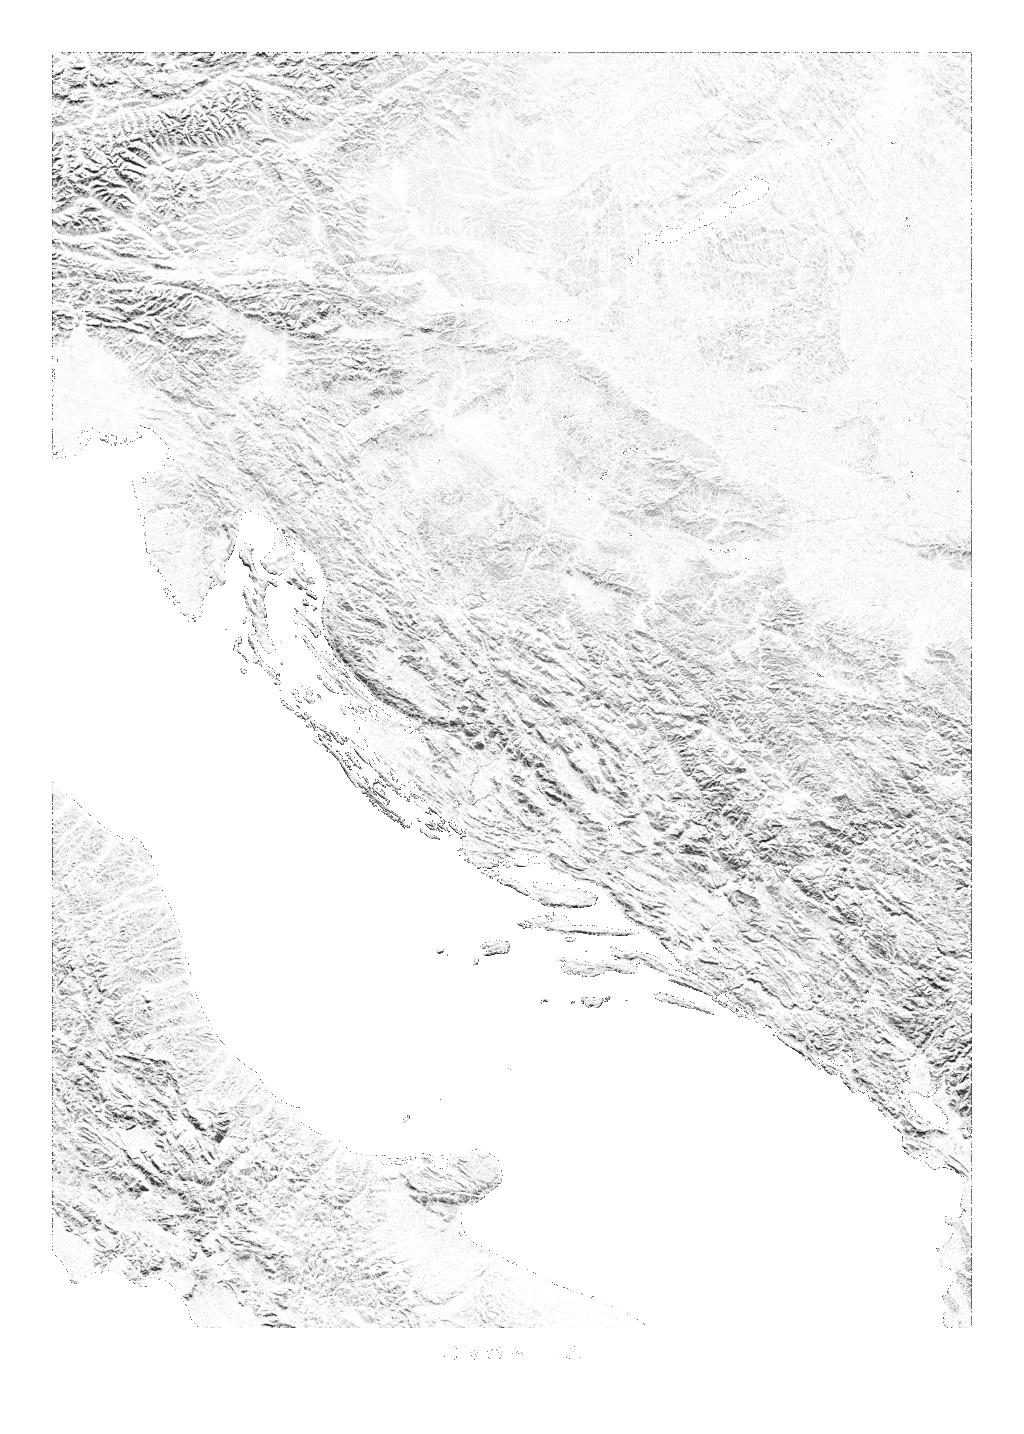 Croatia wall map